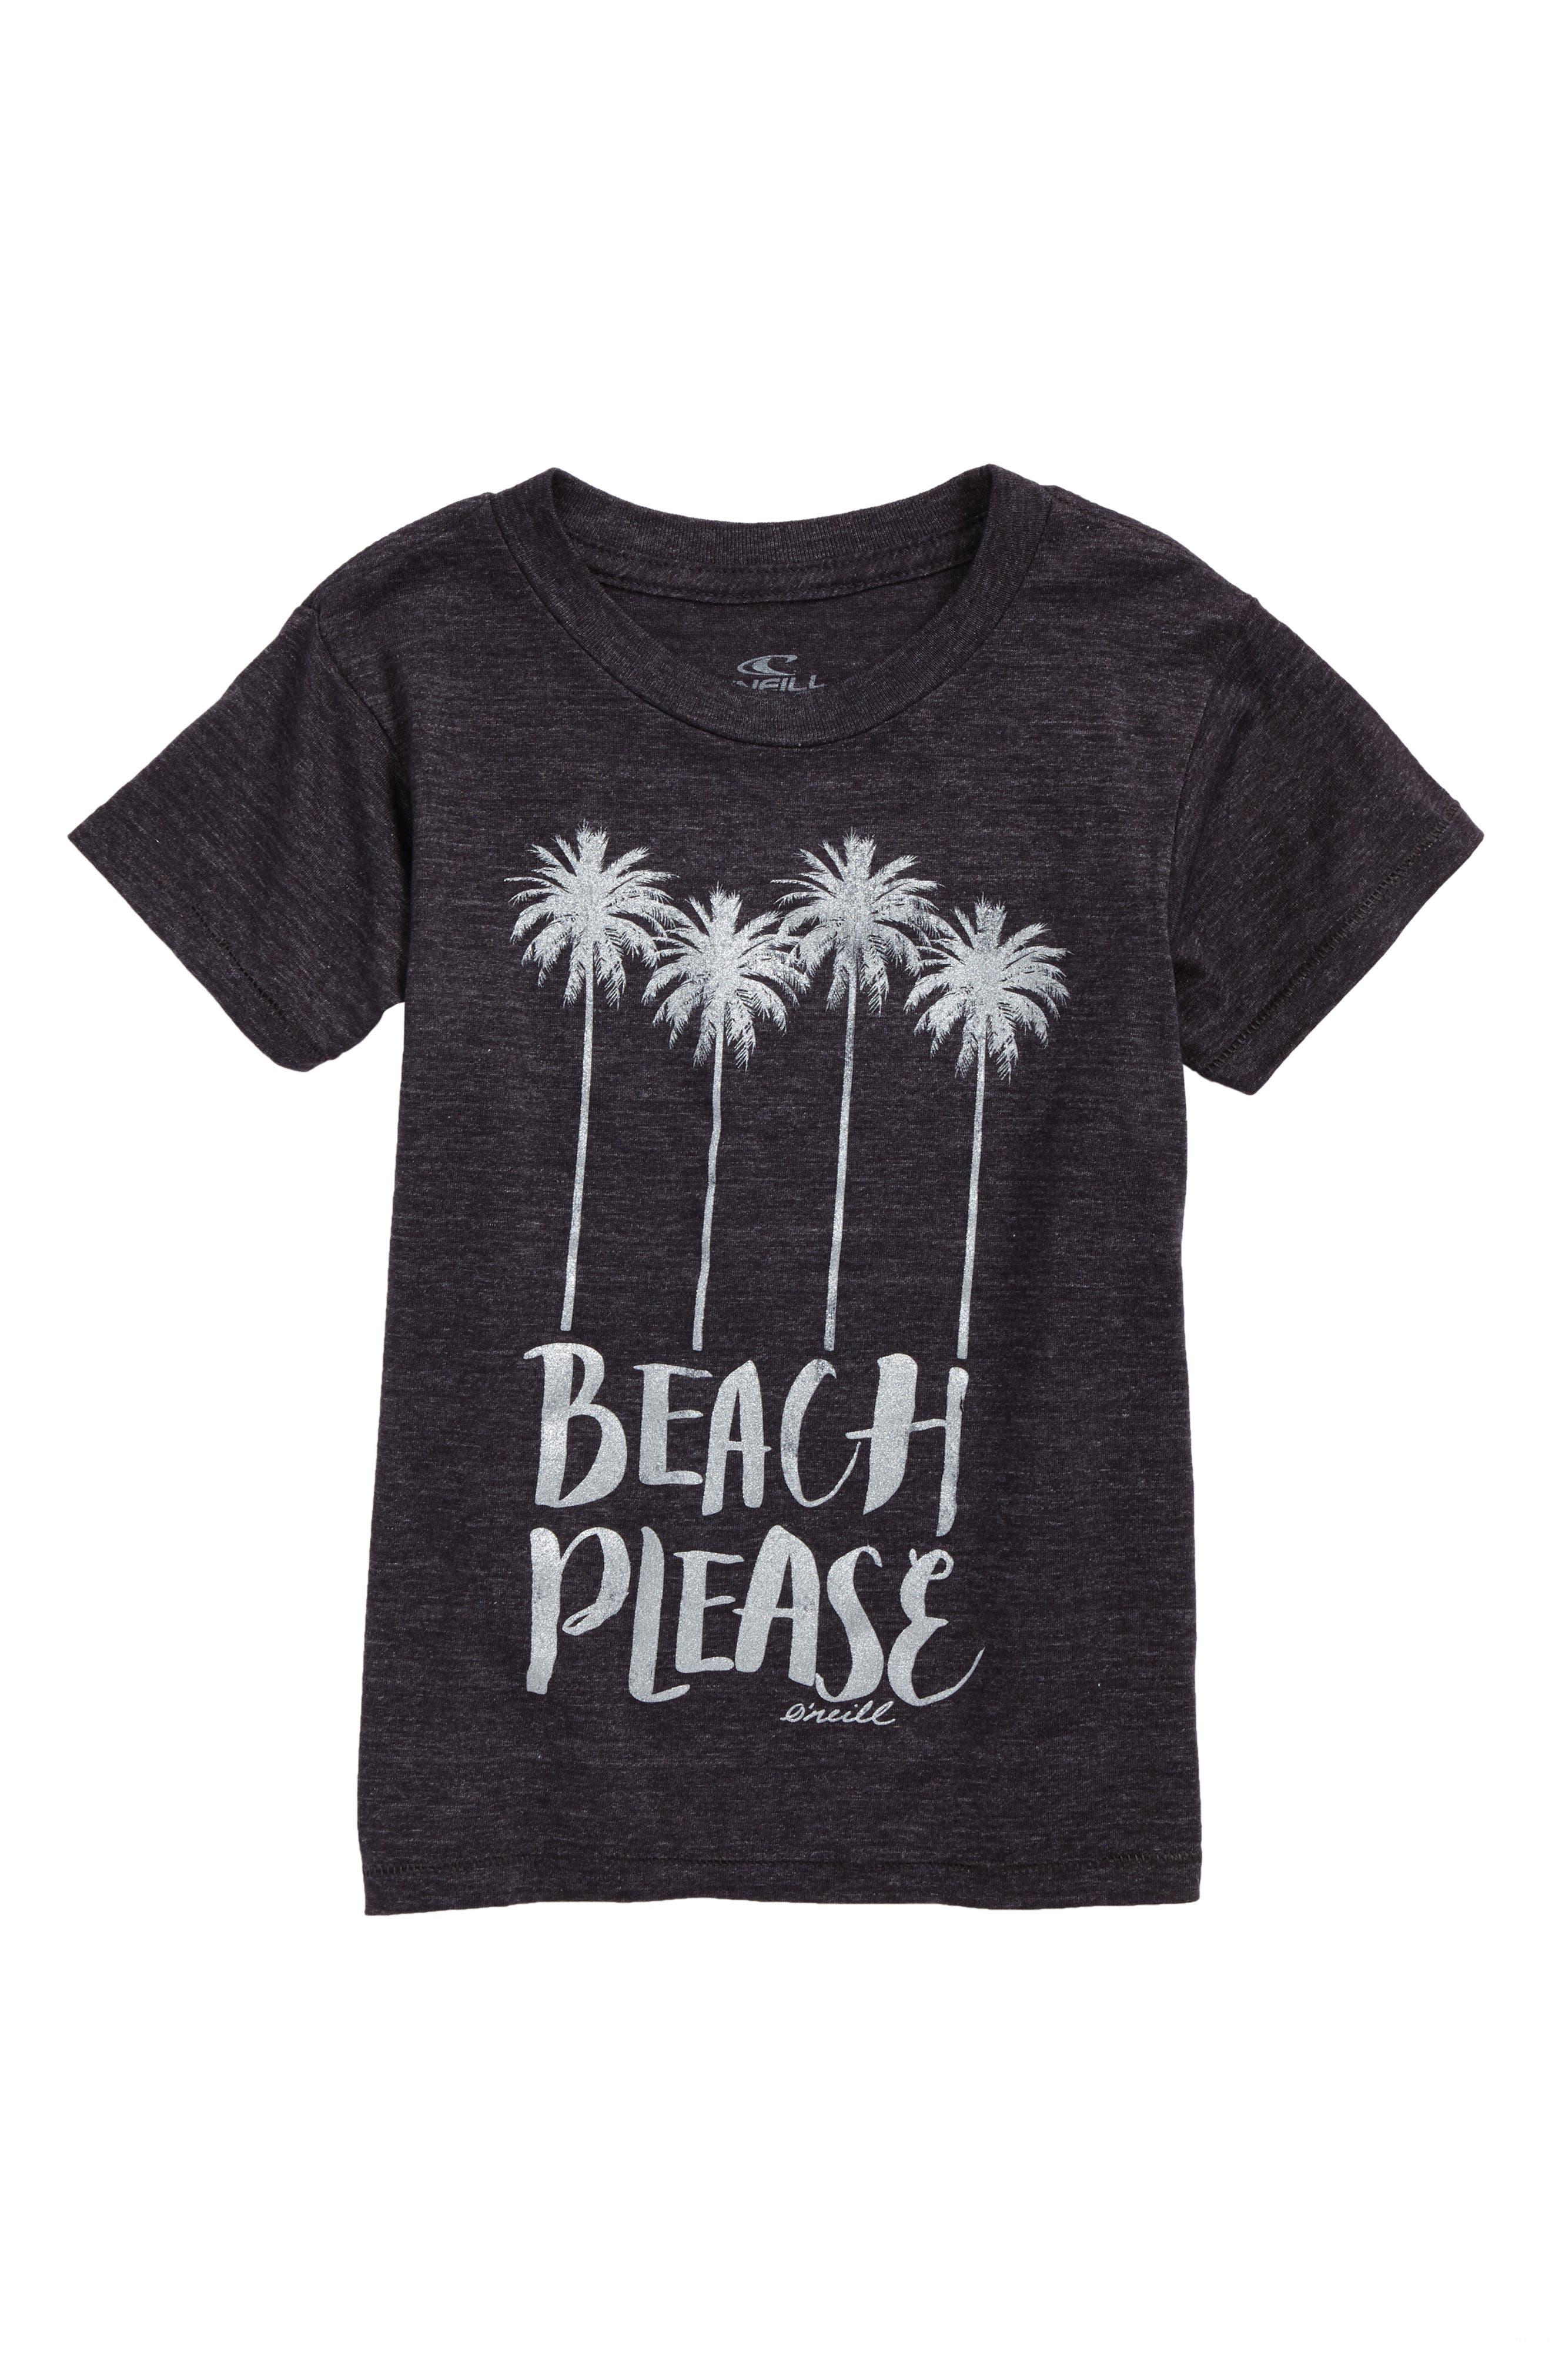 Palm Beach Please Graphic Tee,                         Main,                         color, Periscope